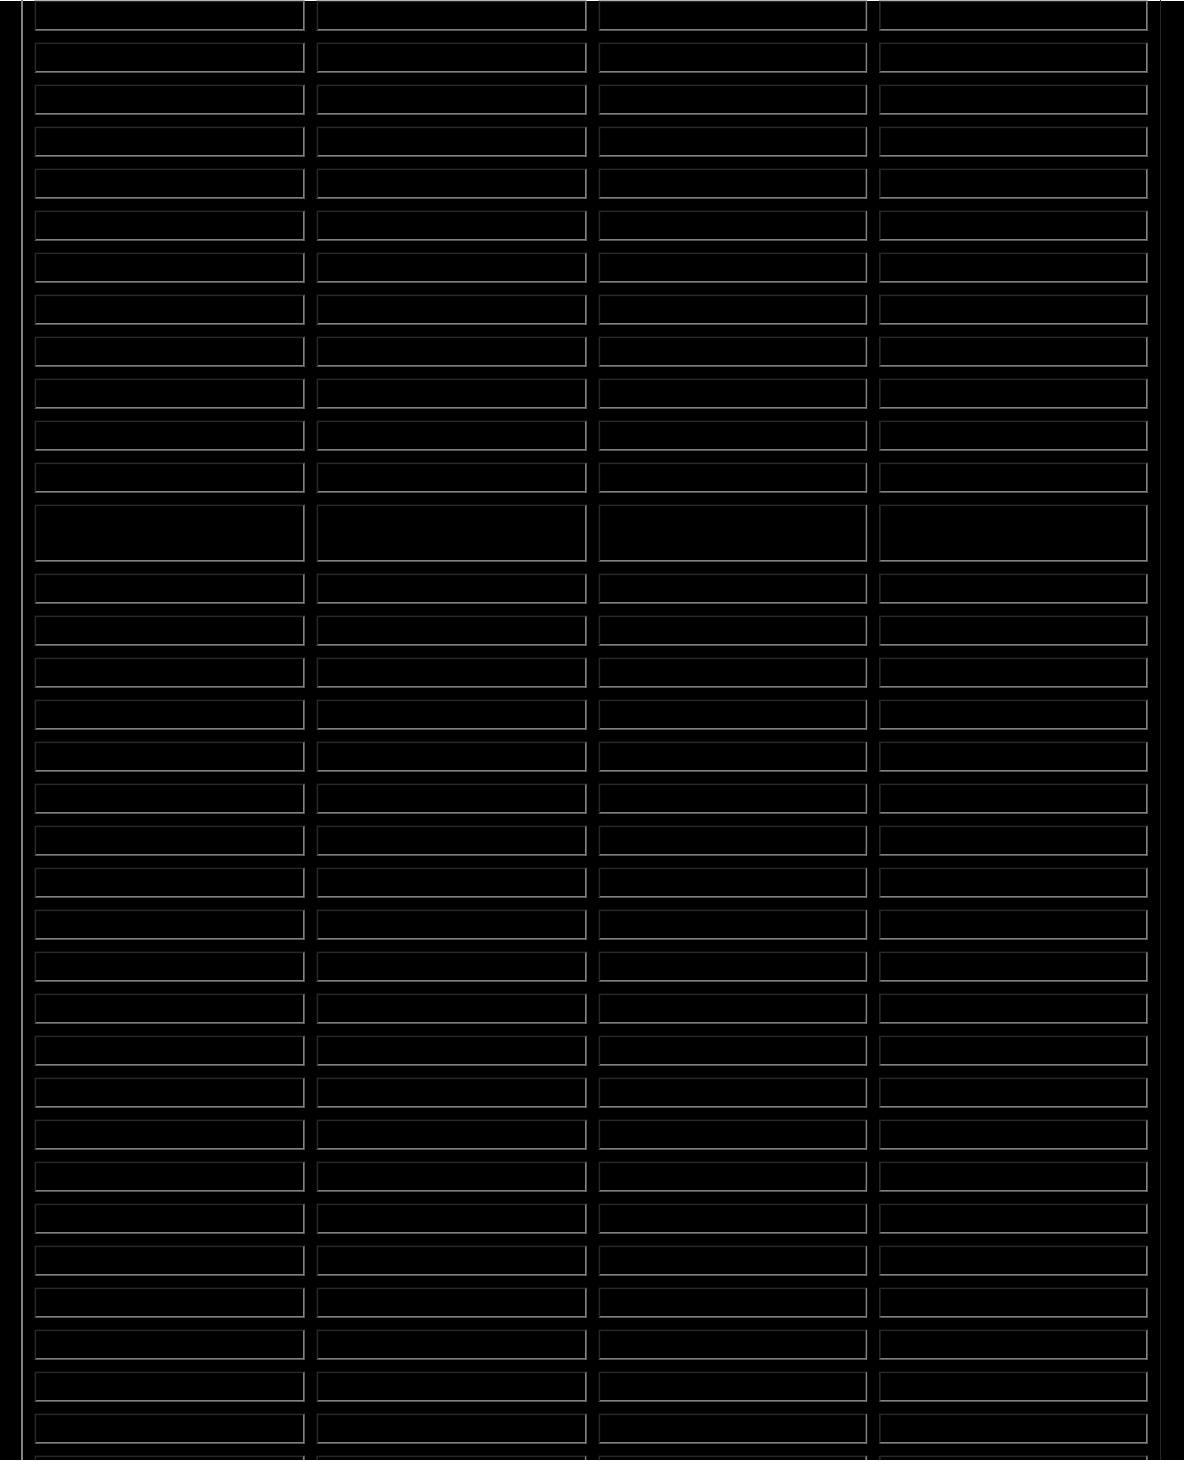 Menu L305 All In One C.b. Tuning Manual Master Volume